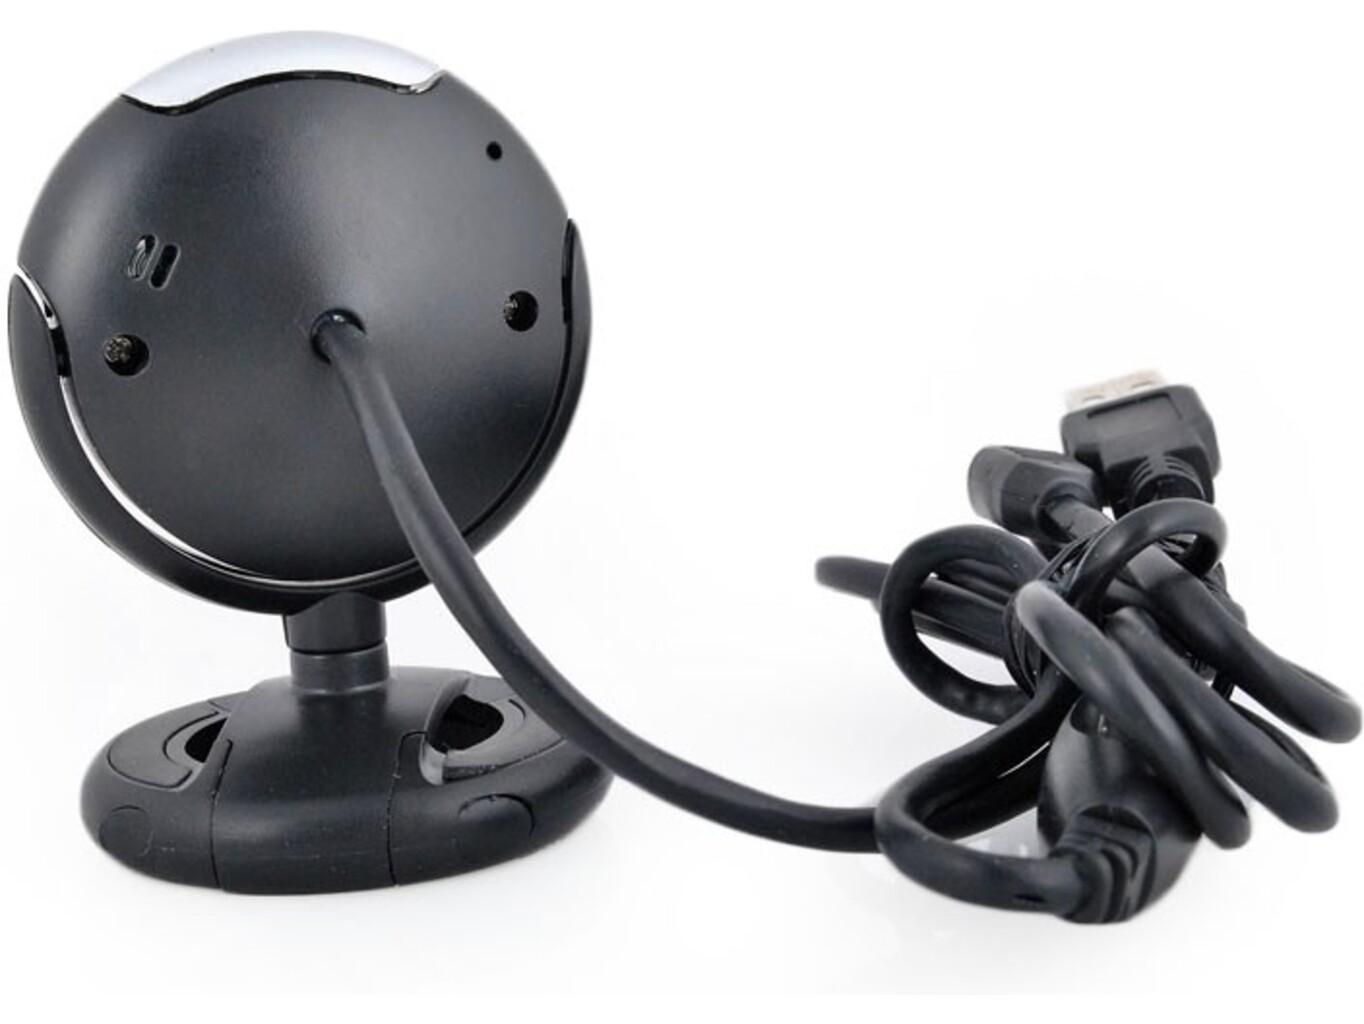 Webkamera USB 12Mpx